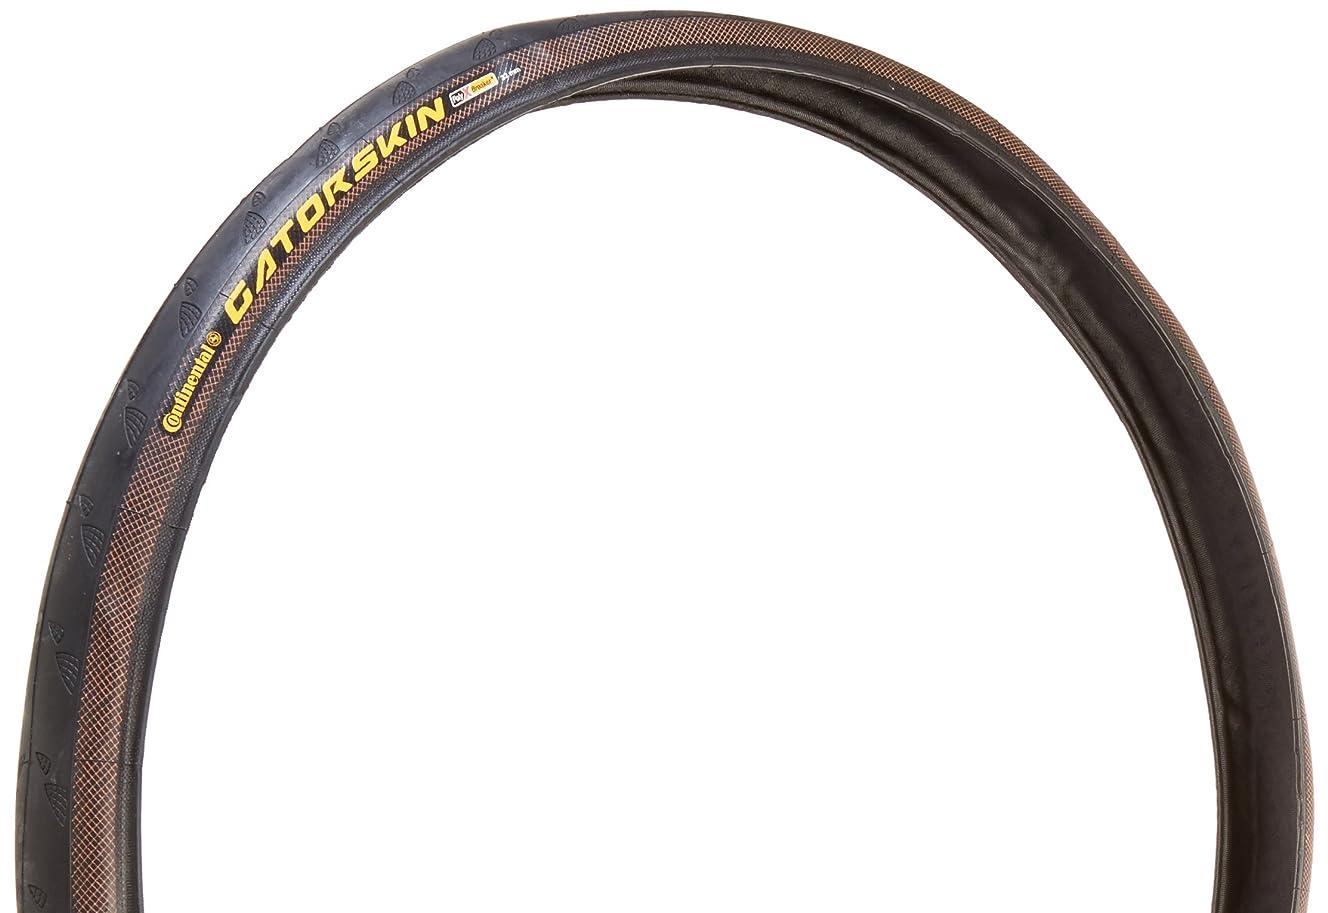 Continental Gatorskin Bike Tire - DuraSkin Puncture & Sidewall Protection, Road Bike Replacement Tire (23c, 25c, 28c, 32c)